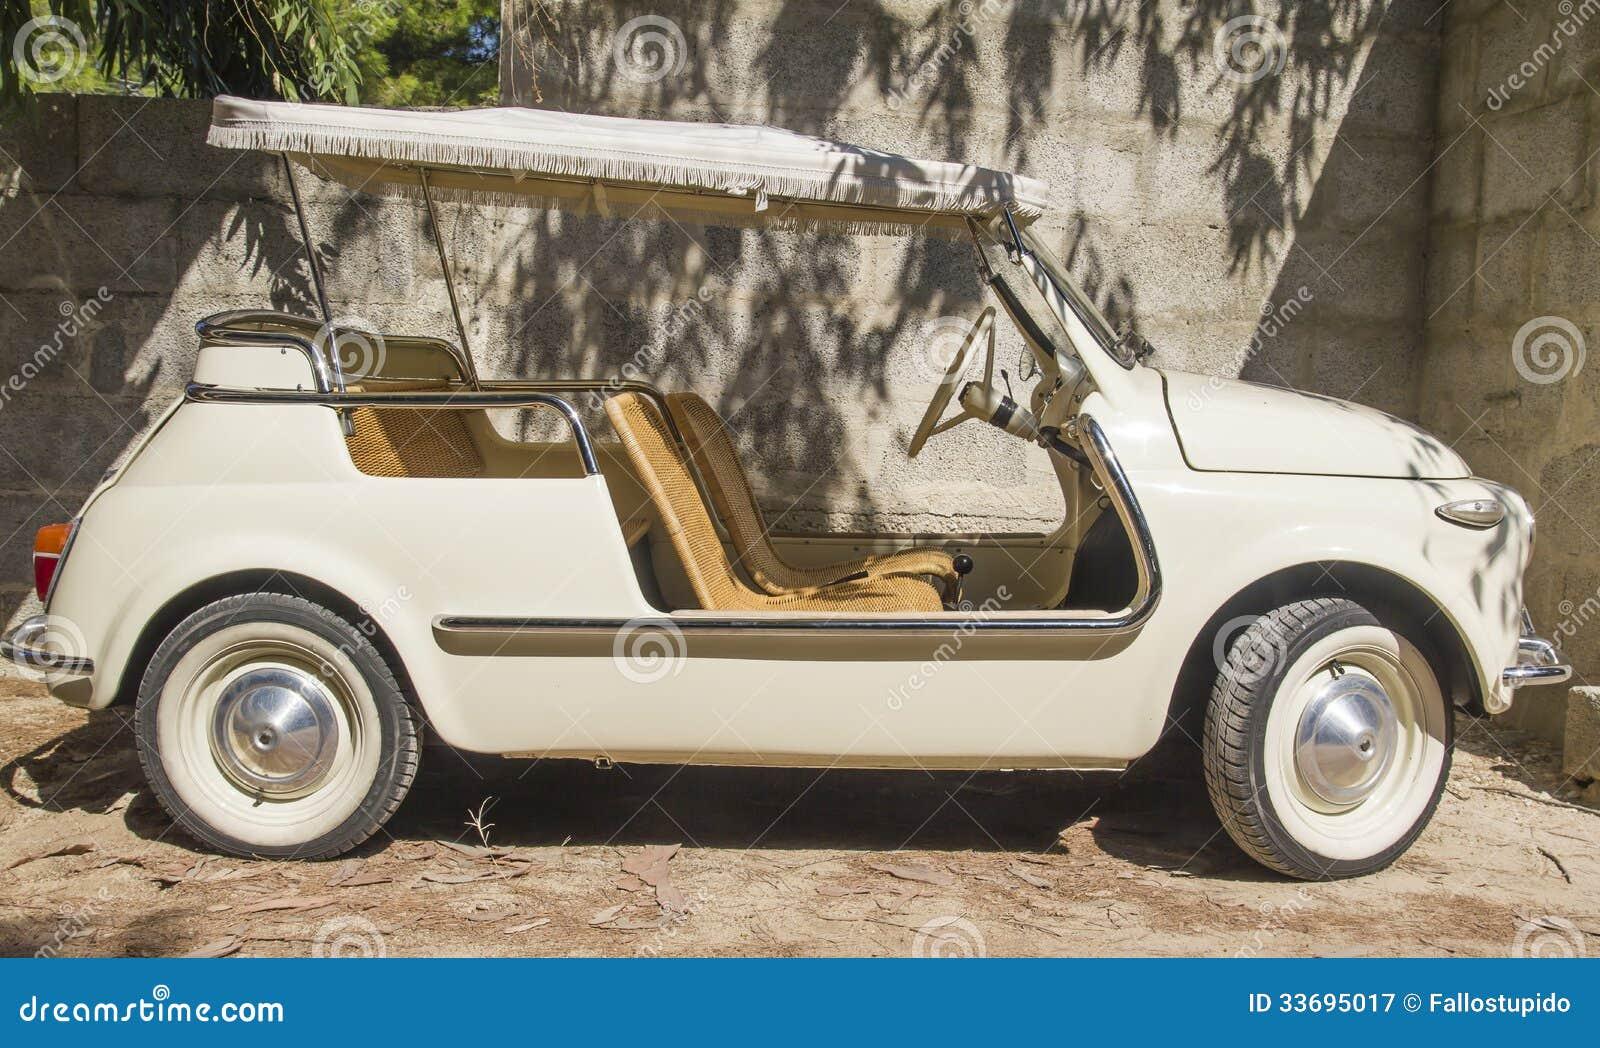 vintage fiat 500 spider cabrio special stock photography. Black Bedroom Furniture Sets. Home Design Ideas